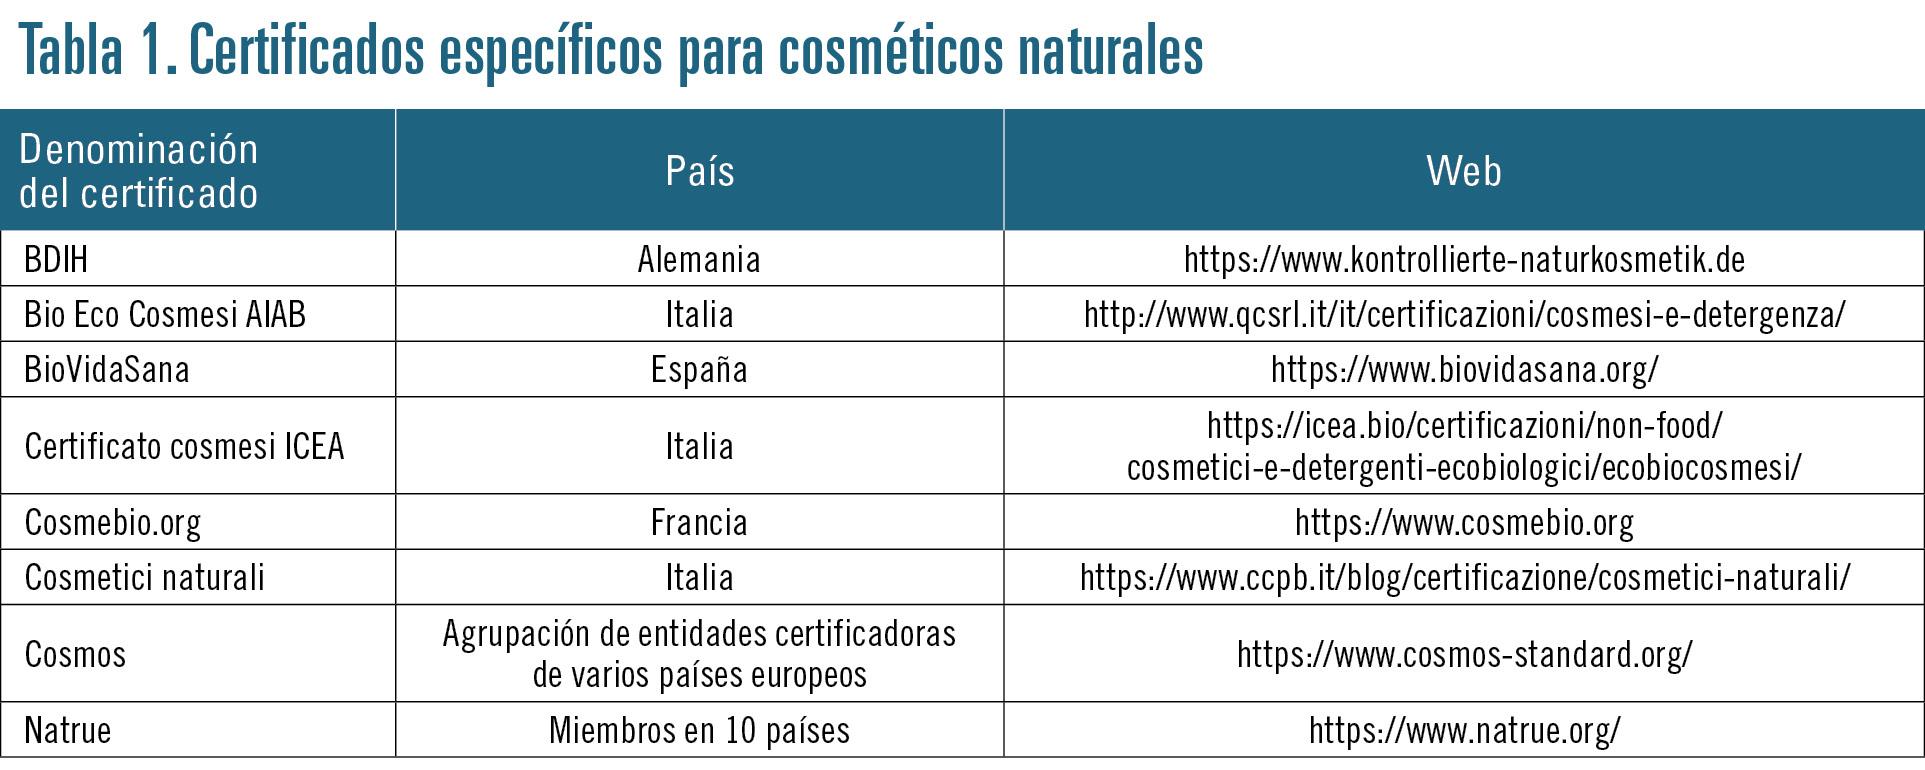 26 EF593 PROFESION cosmetica natural tabla01